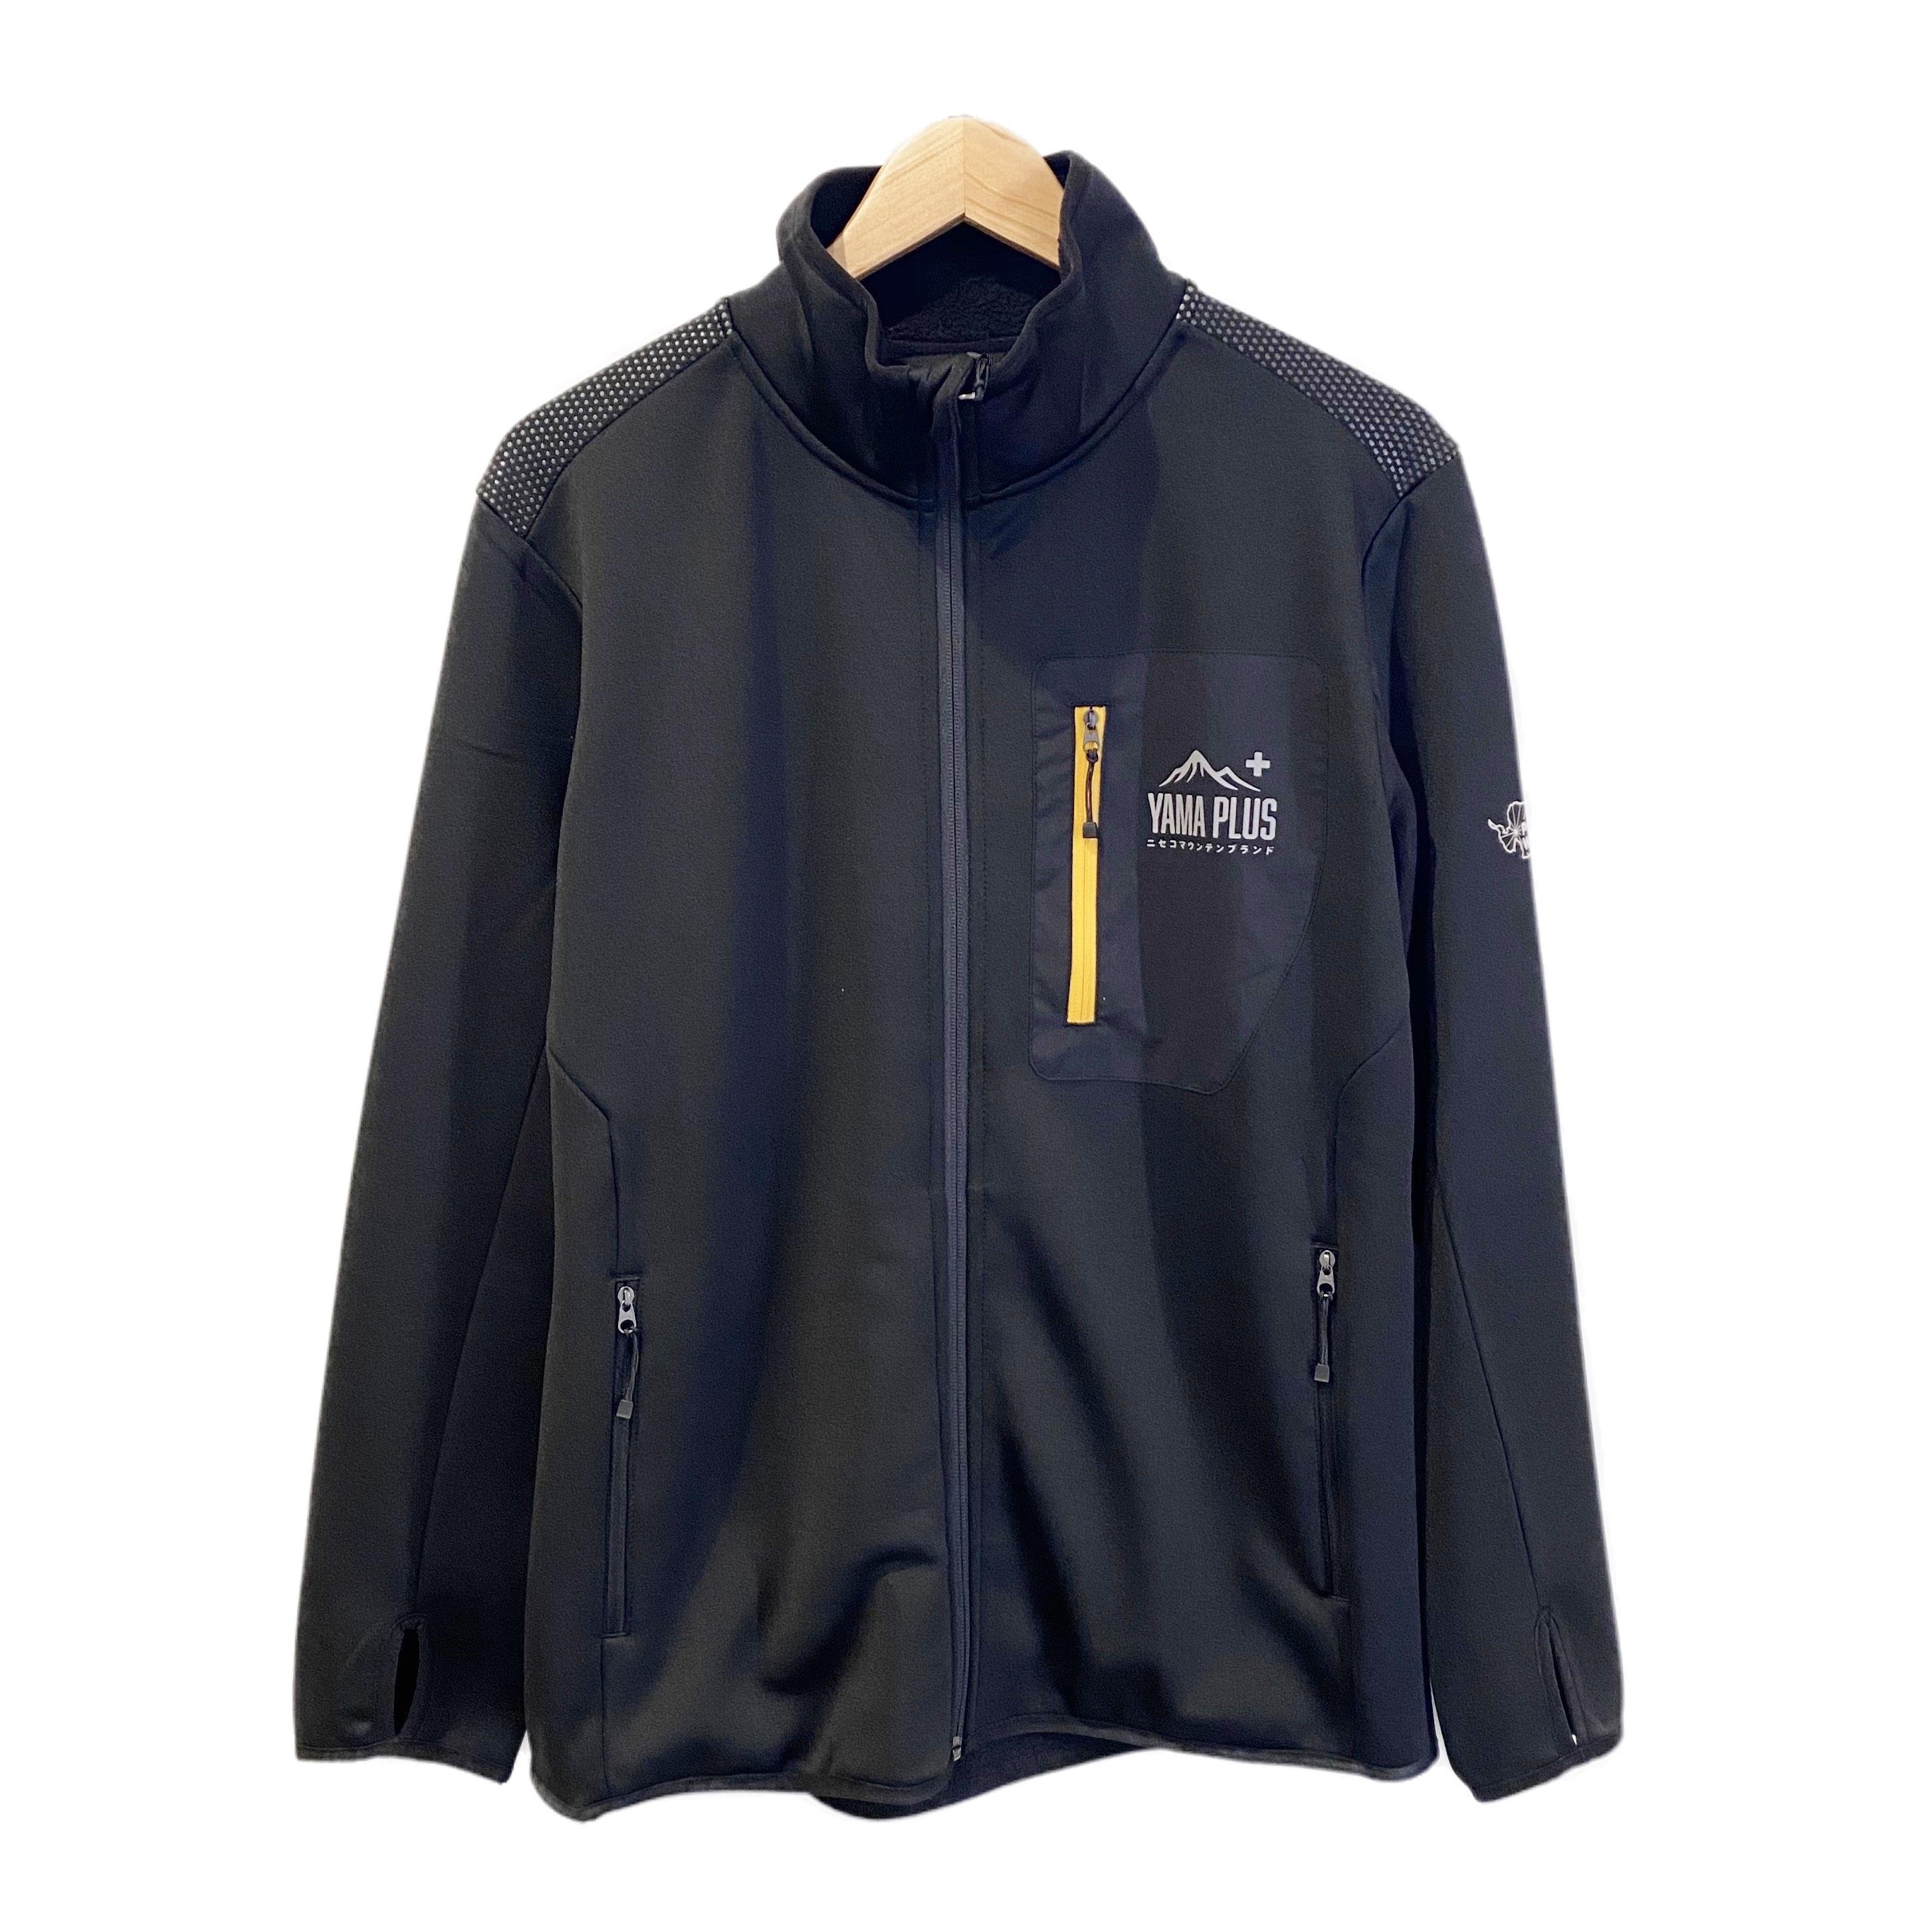 Mid Layer Jacket